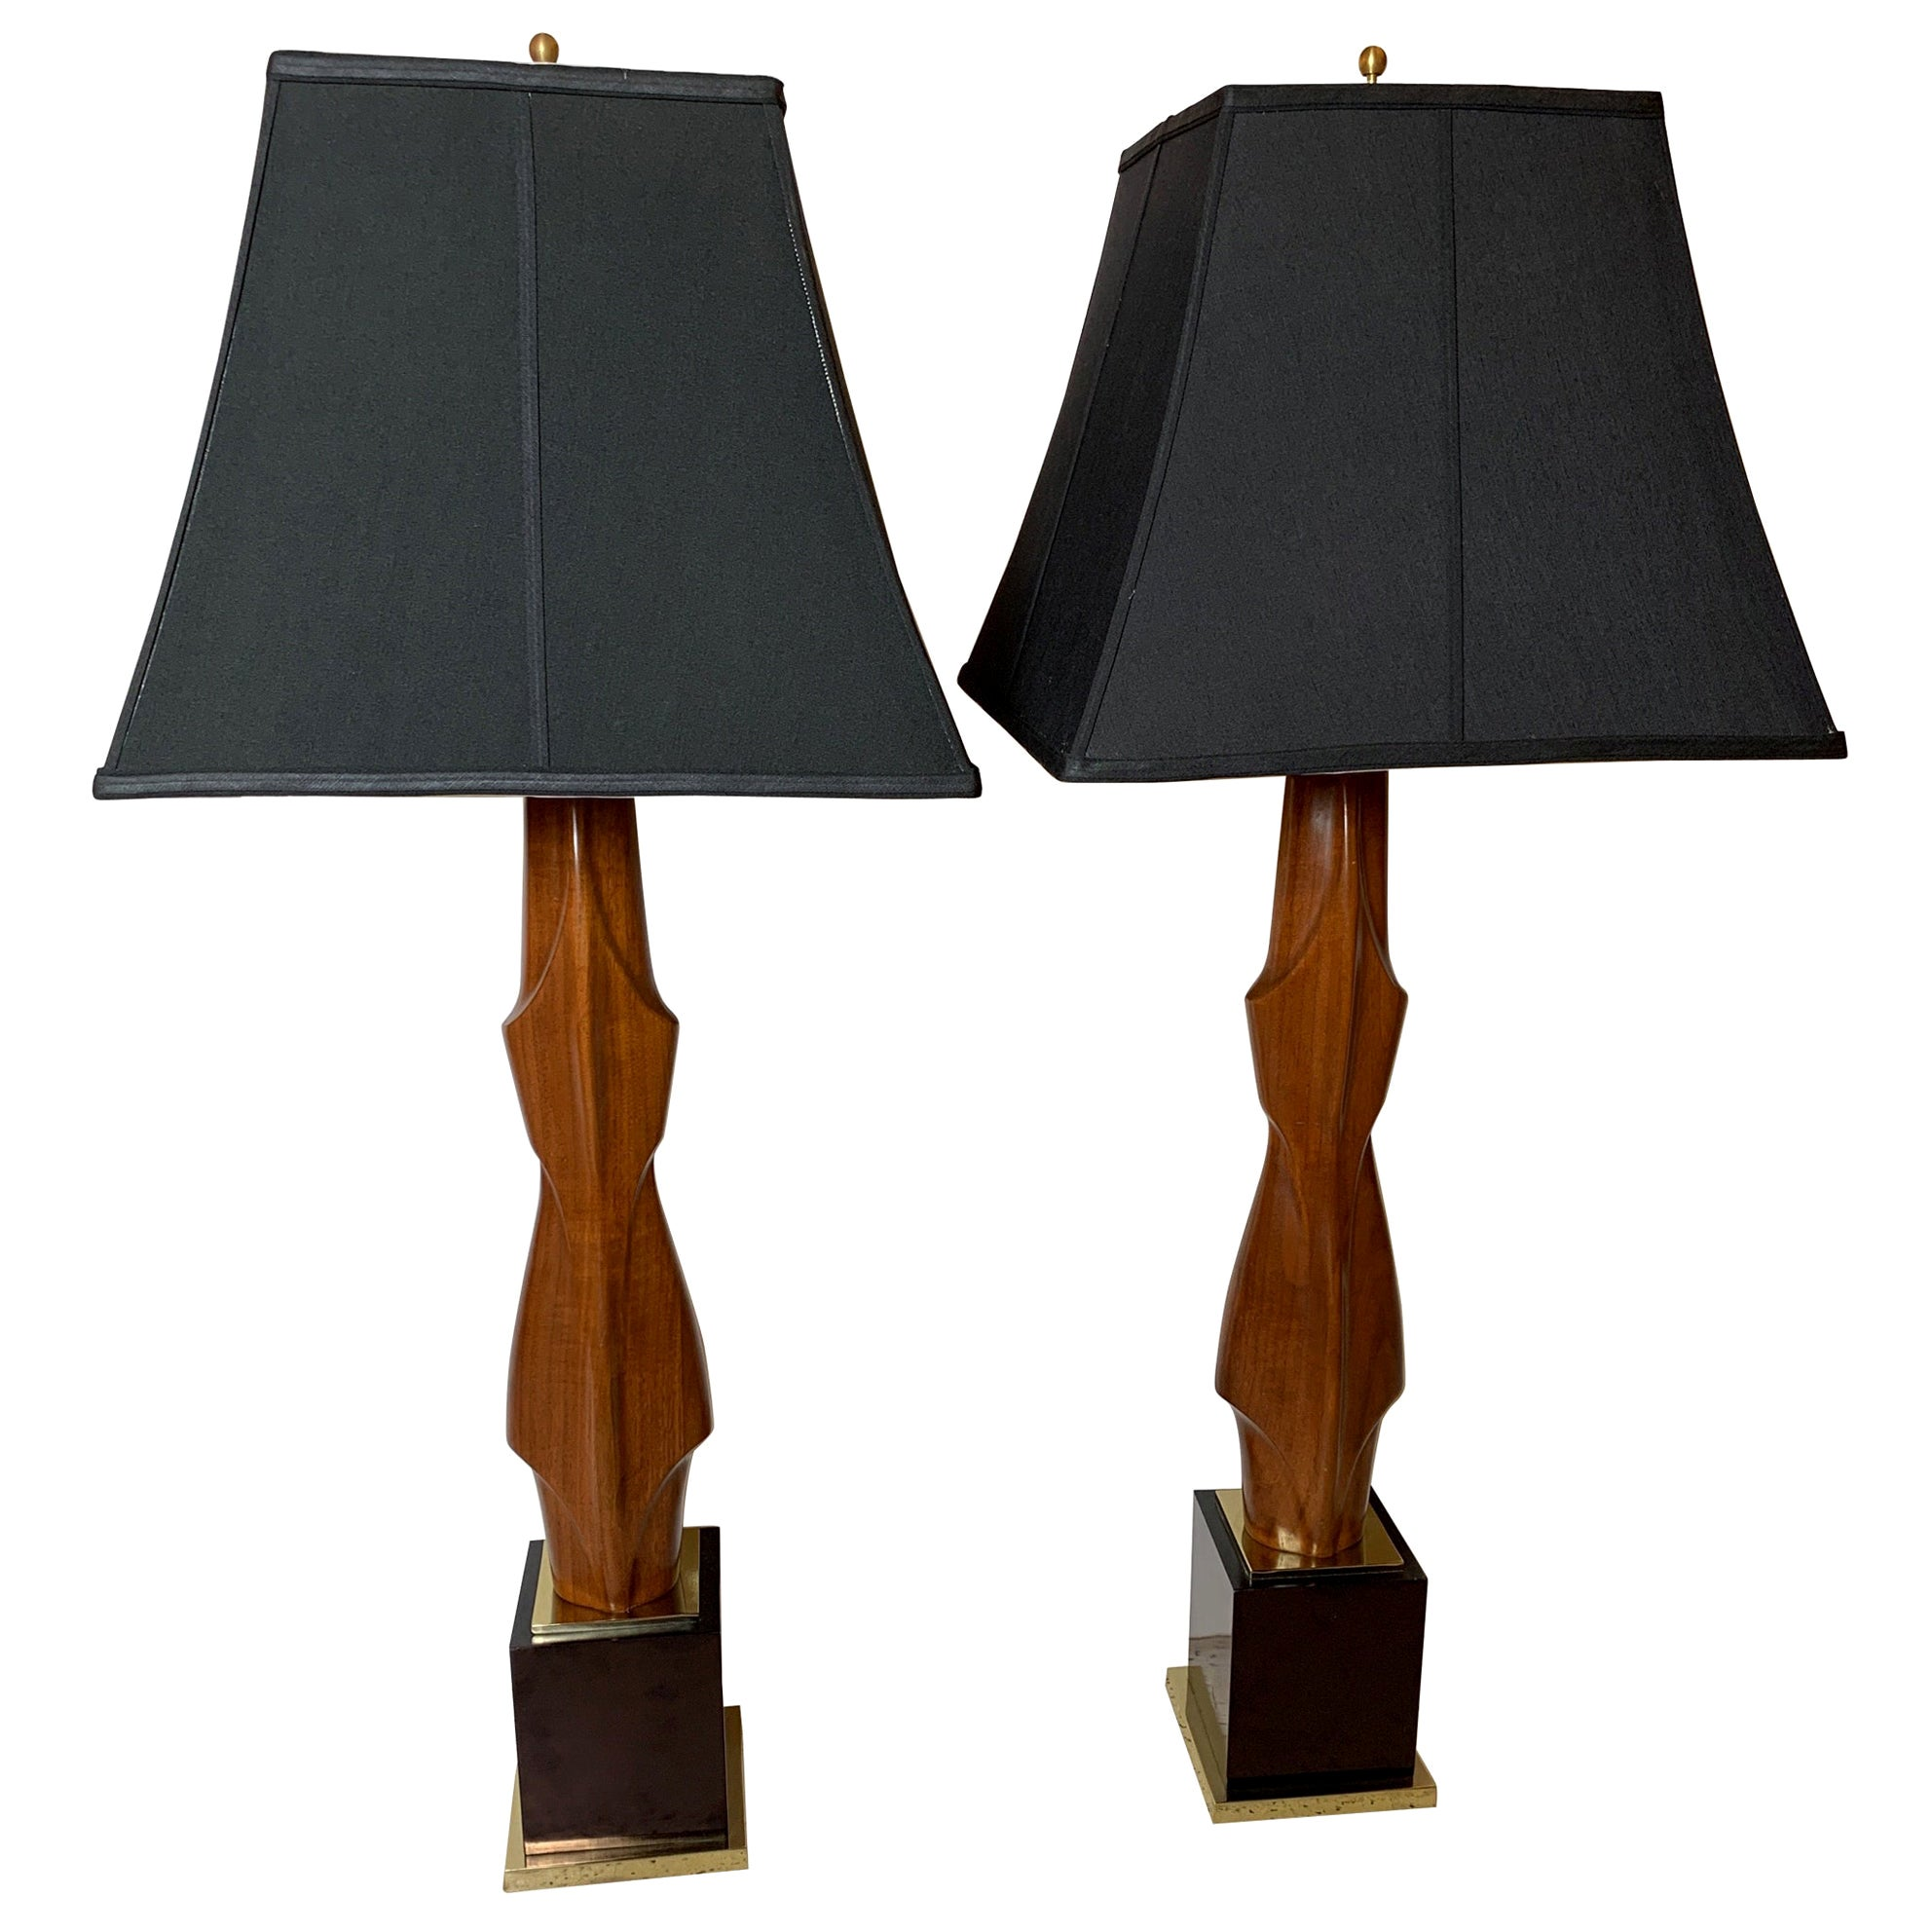 Pair of Mahogany Figural Midcentury Lamps by Laurel Lamp Co.